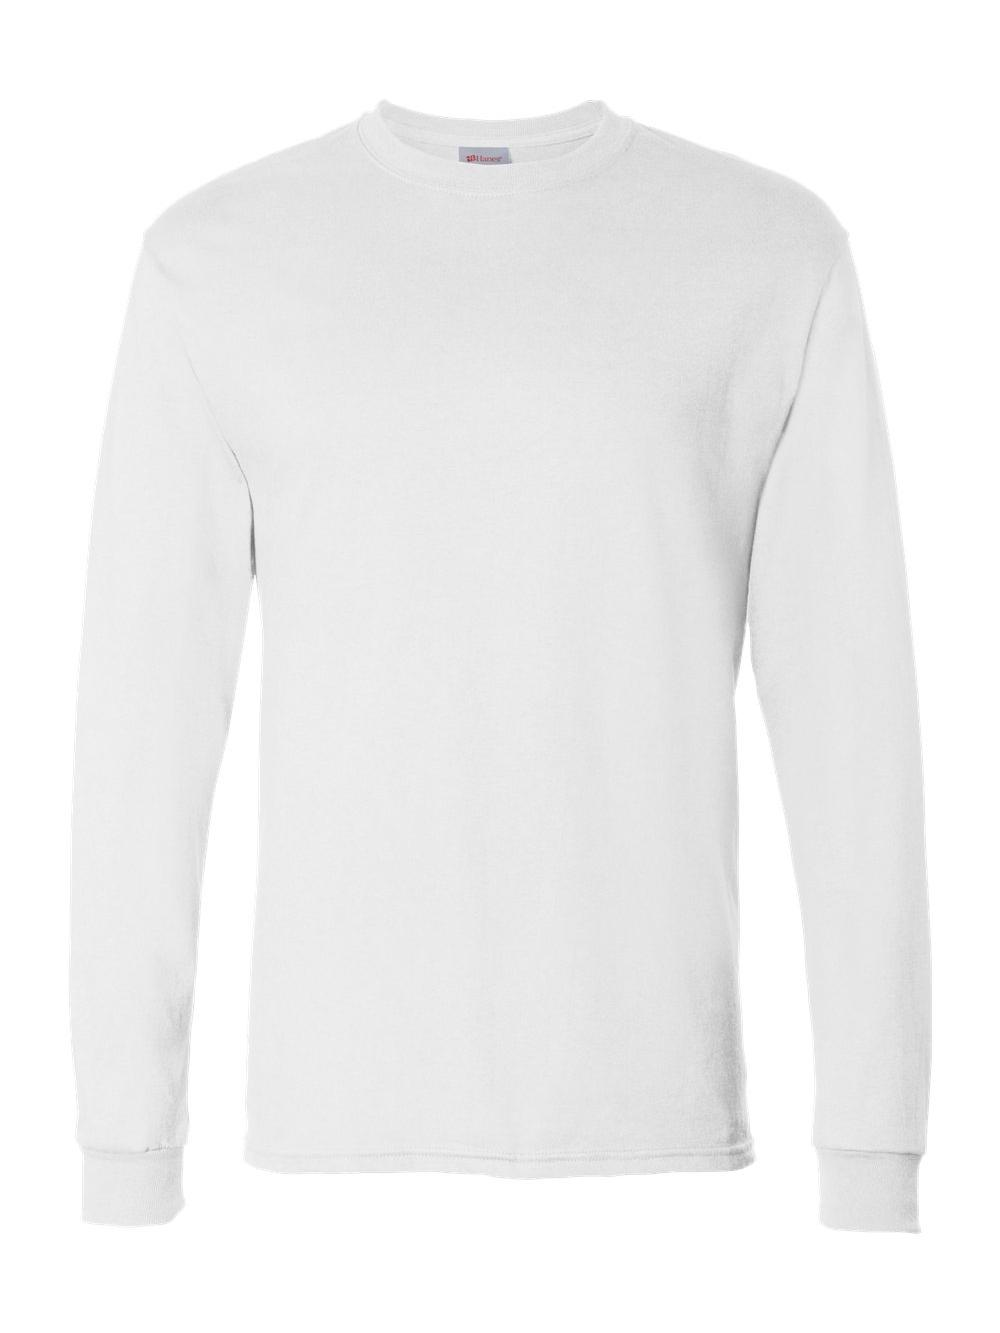 b975214e Hanes Blank ComfortSoft Cotton Heavyweight Long Sleeve T Shirt 5286 ...